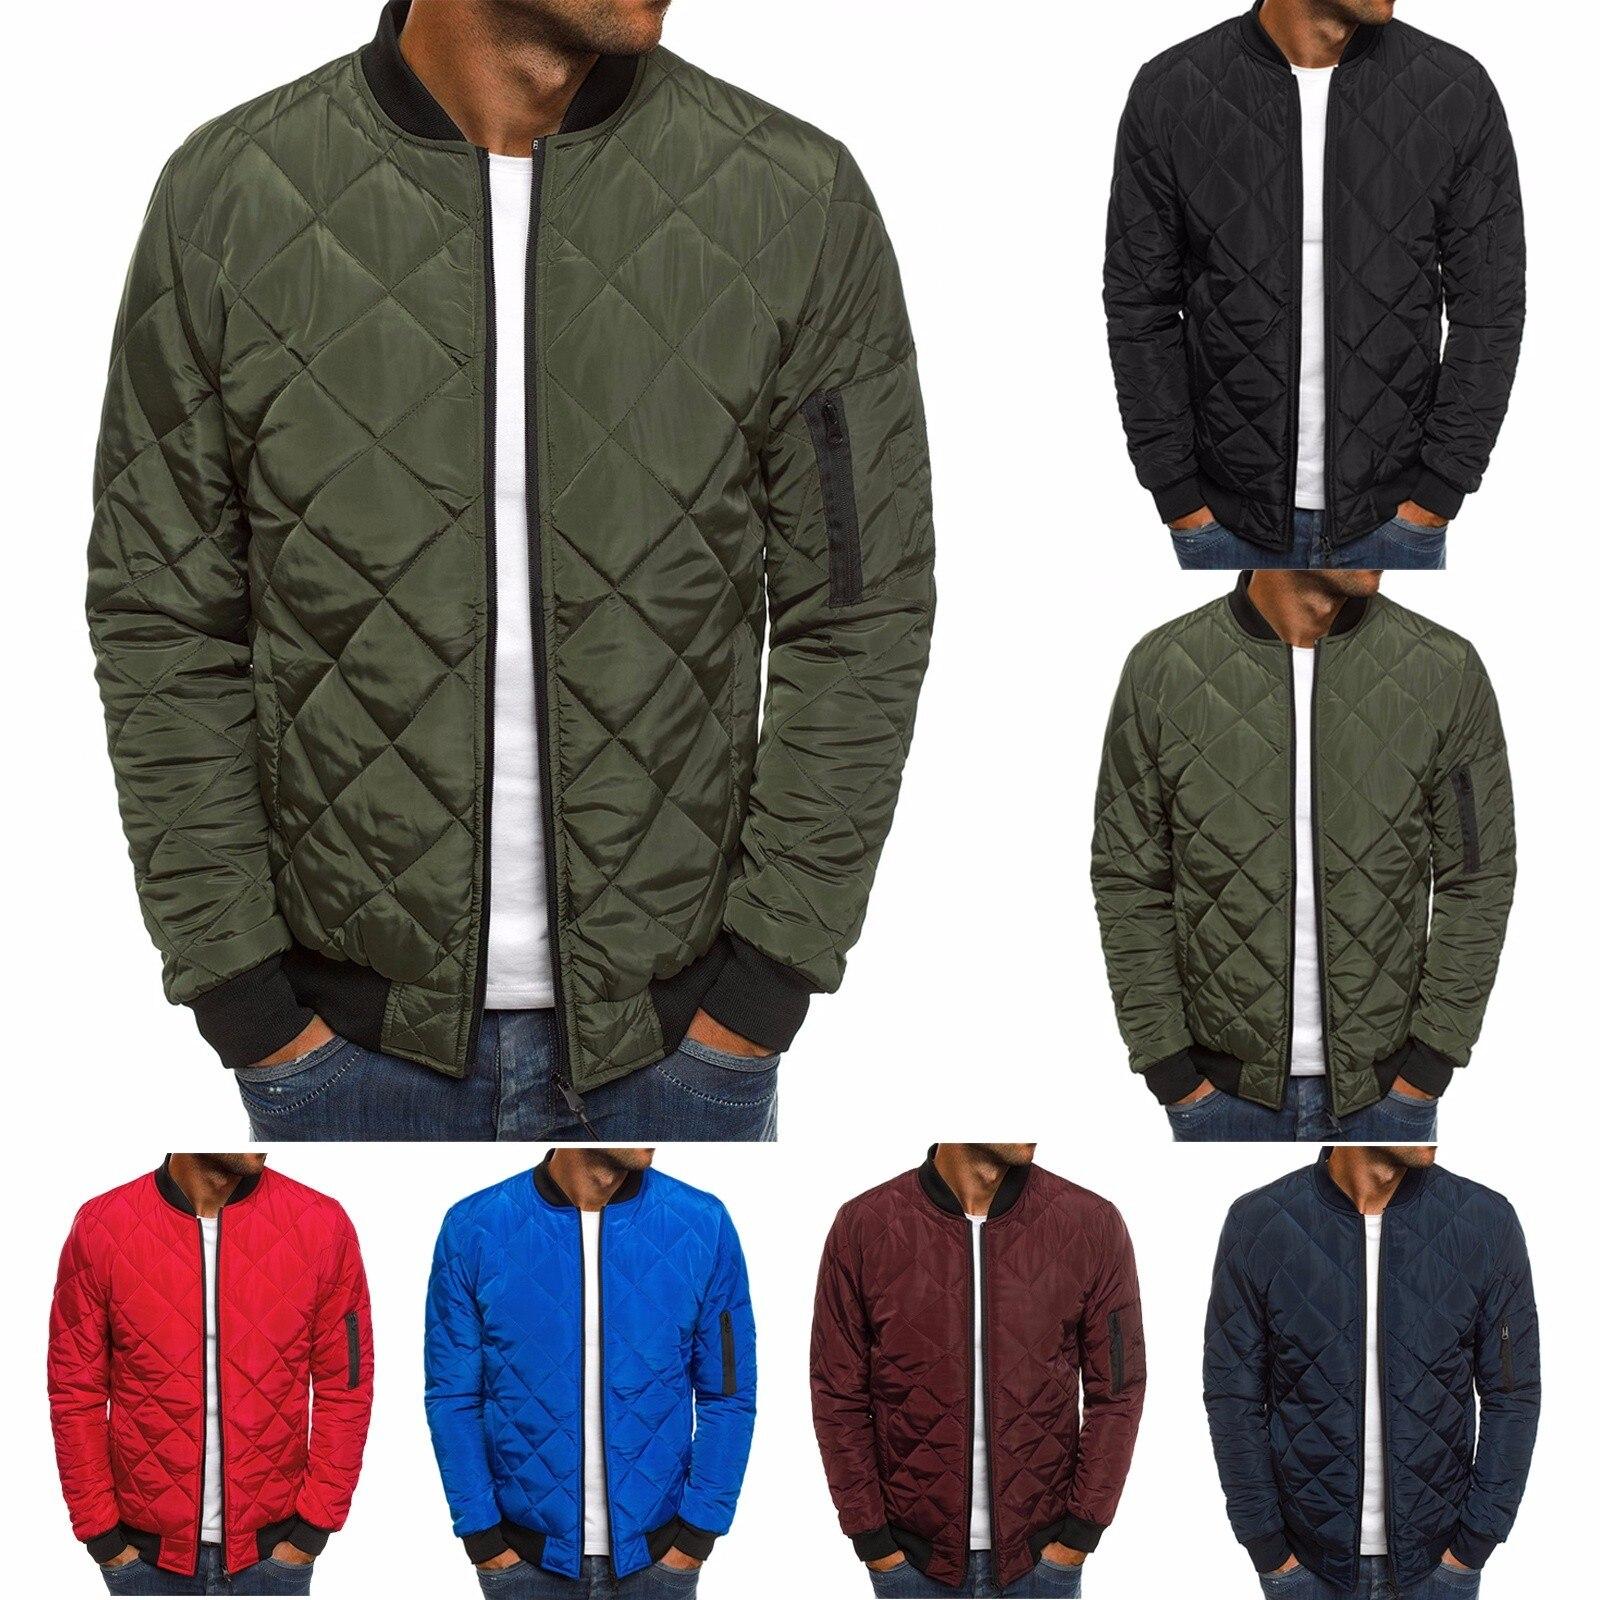 ZOGAA Mens Winter Jackets And Coats Casual Plaid Parka Jackets Windbreaker Solid Brand Warm Clothes Zipper Men Jackets Overcoat